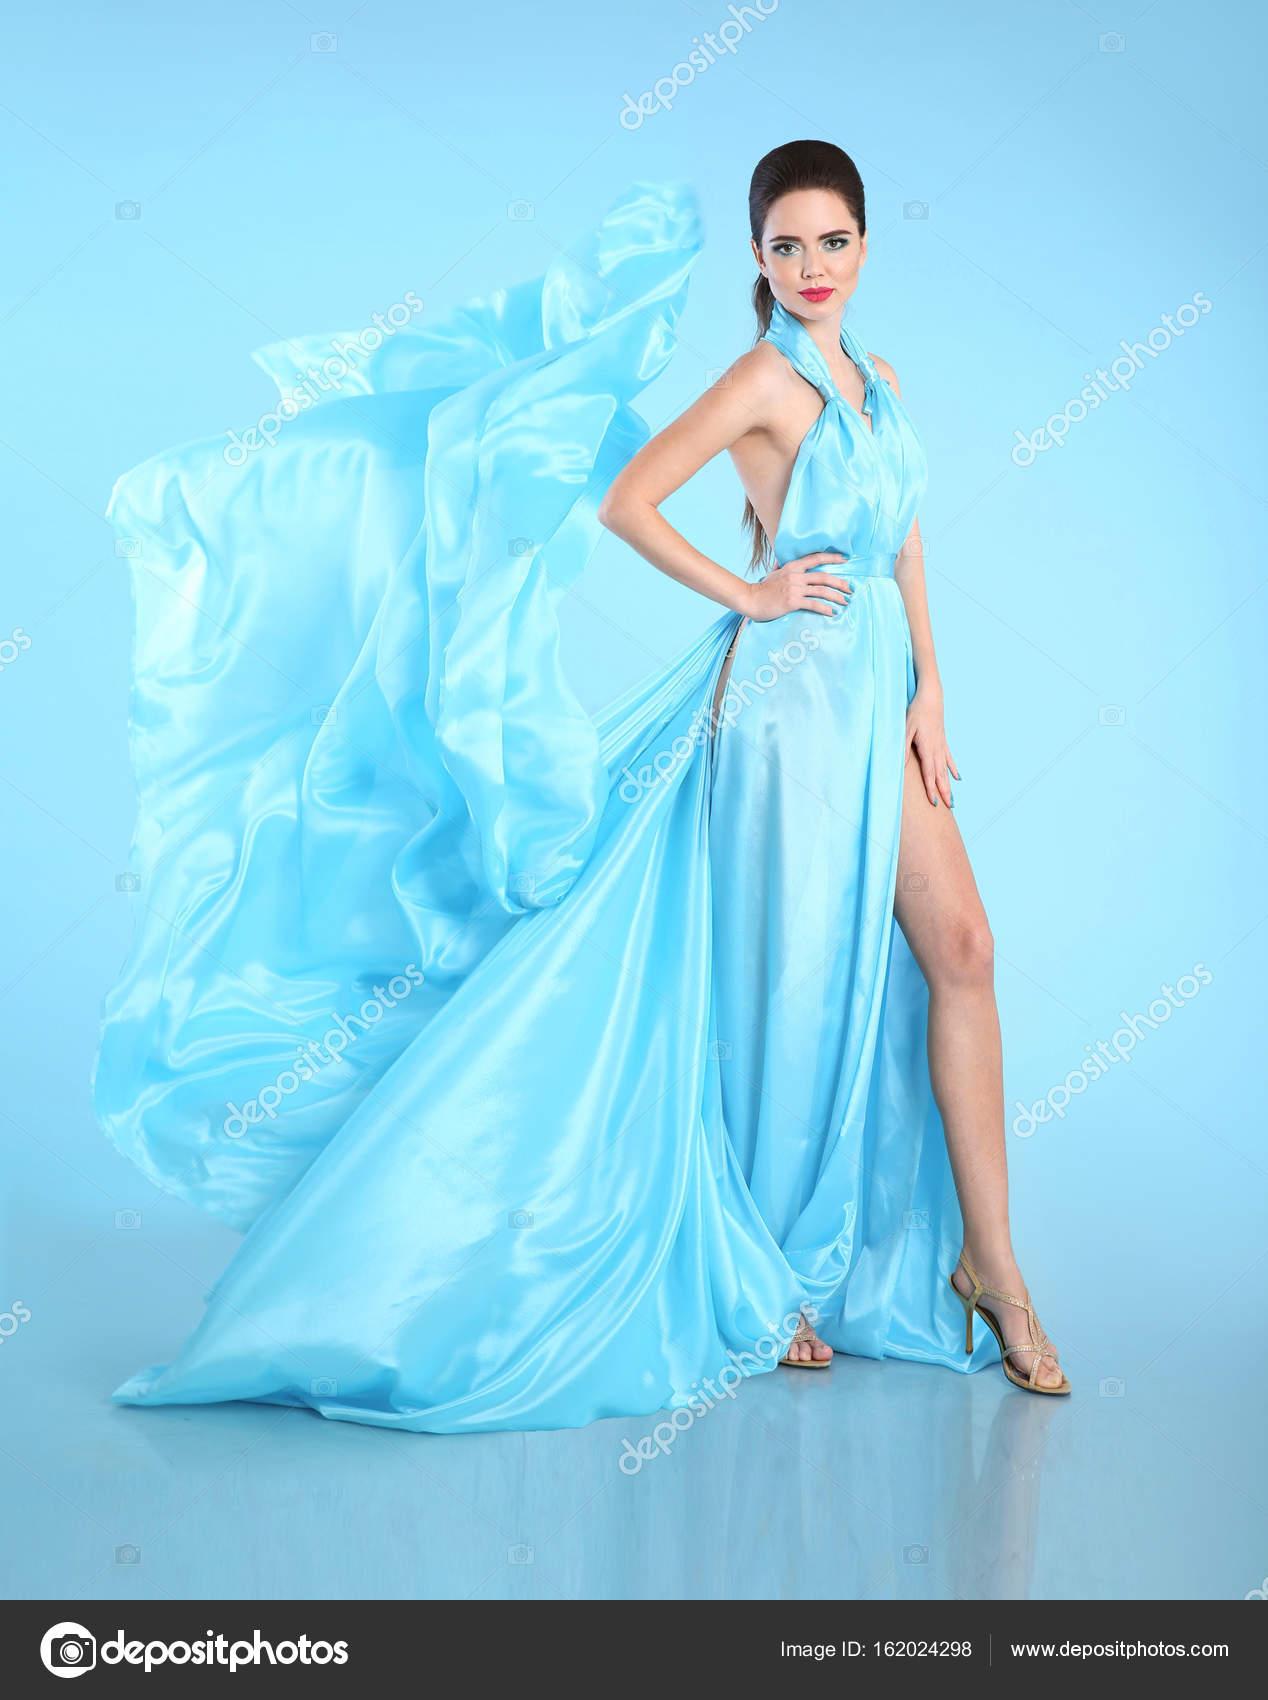 Vestidos azul turquesa en morenas